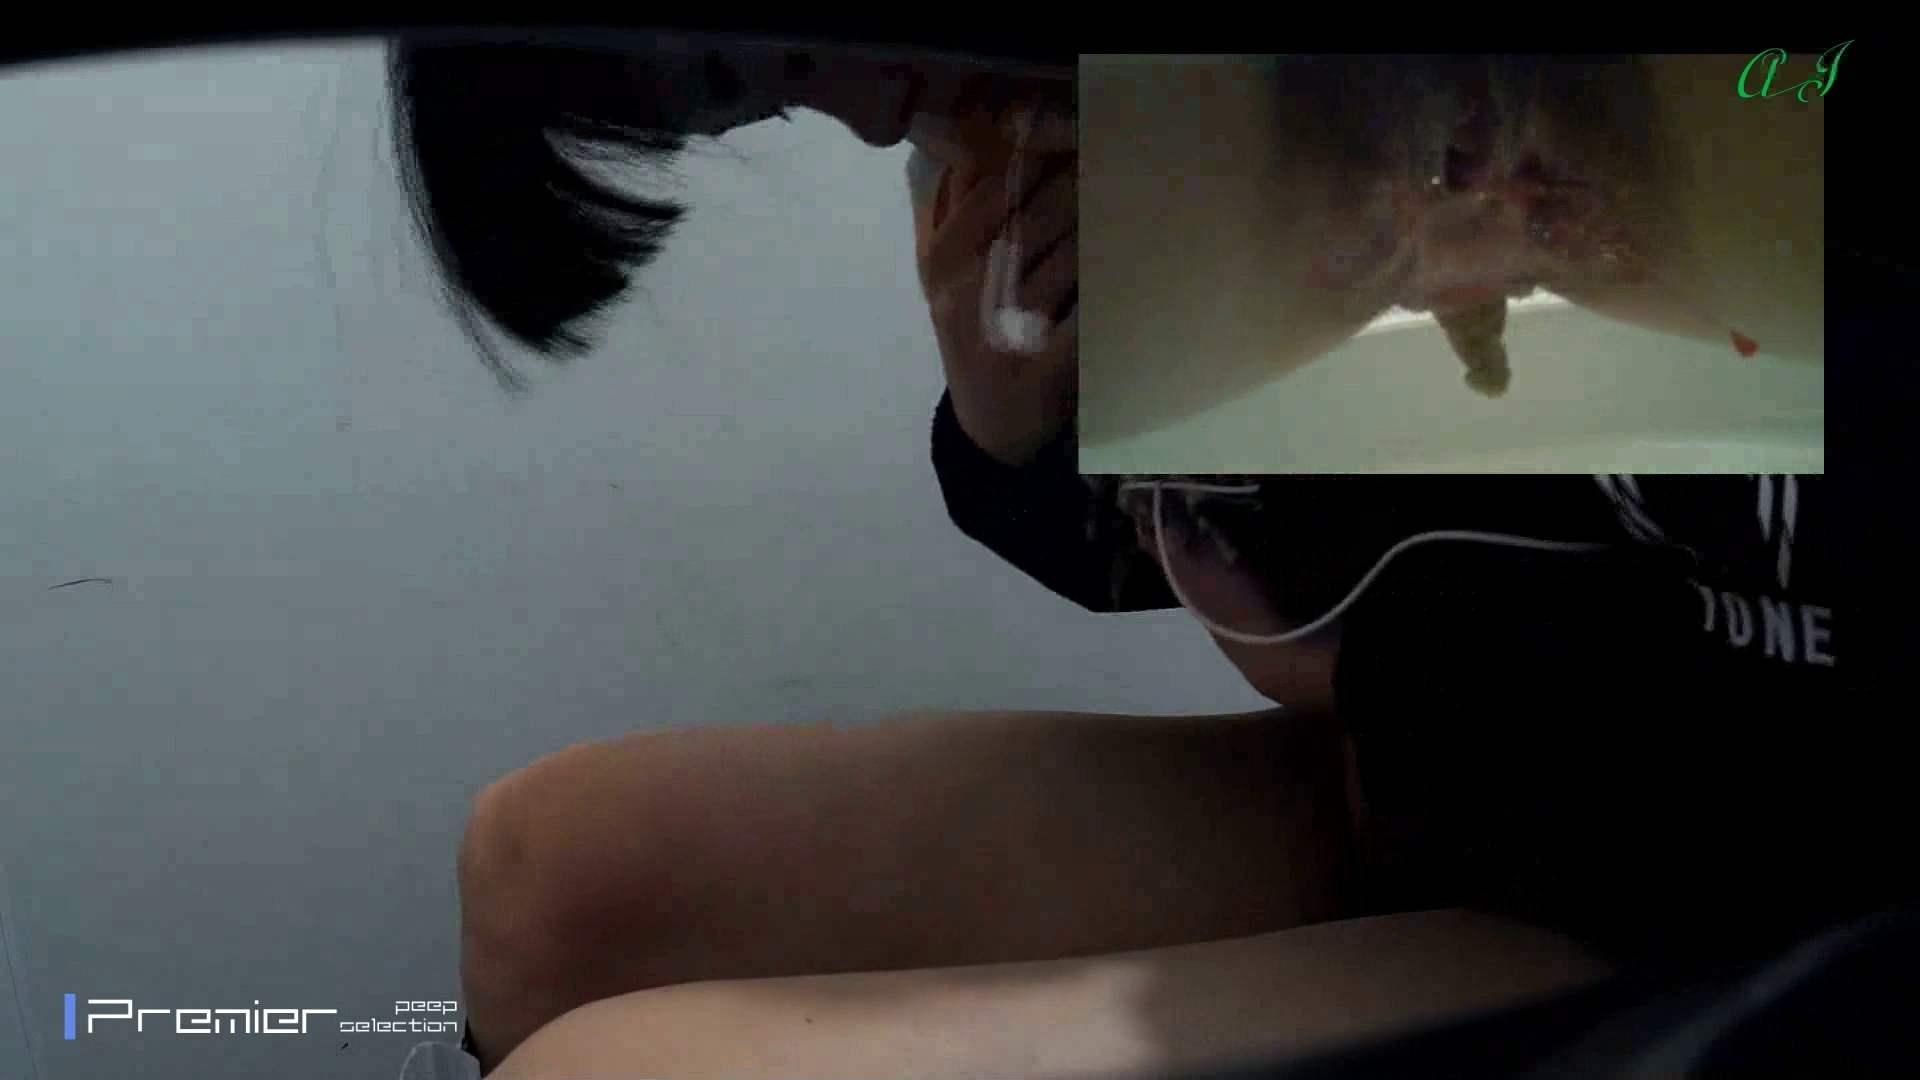 大あり美JDトイレ盗撮【有名大学女性洗面所 vol.80】 高画質  113PIX 101